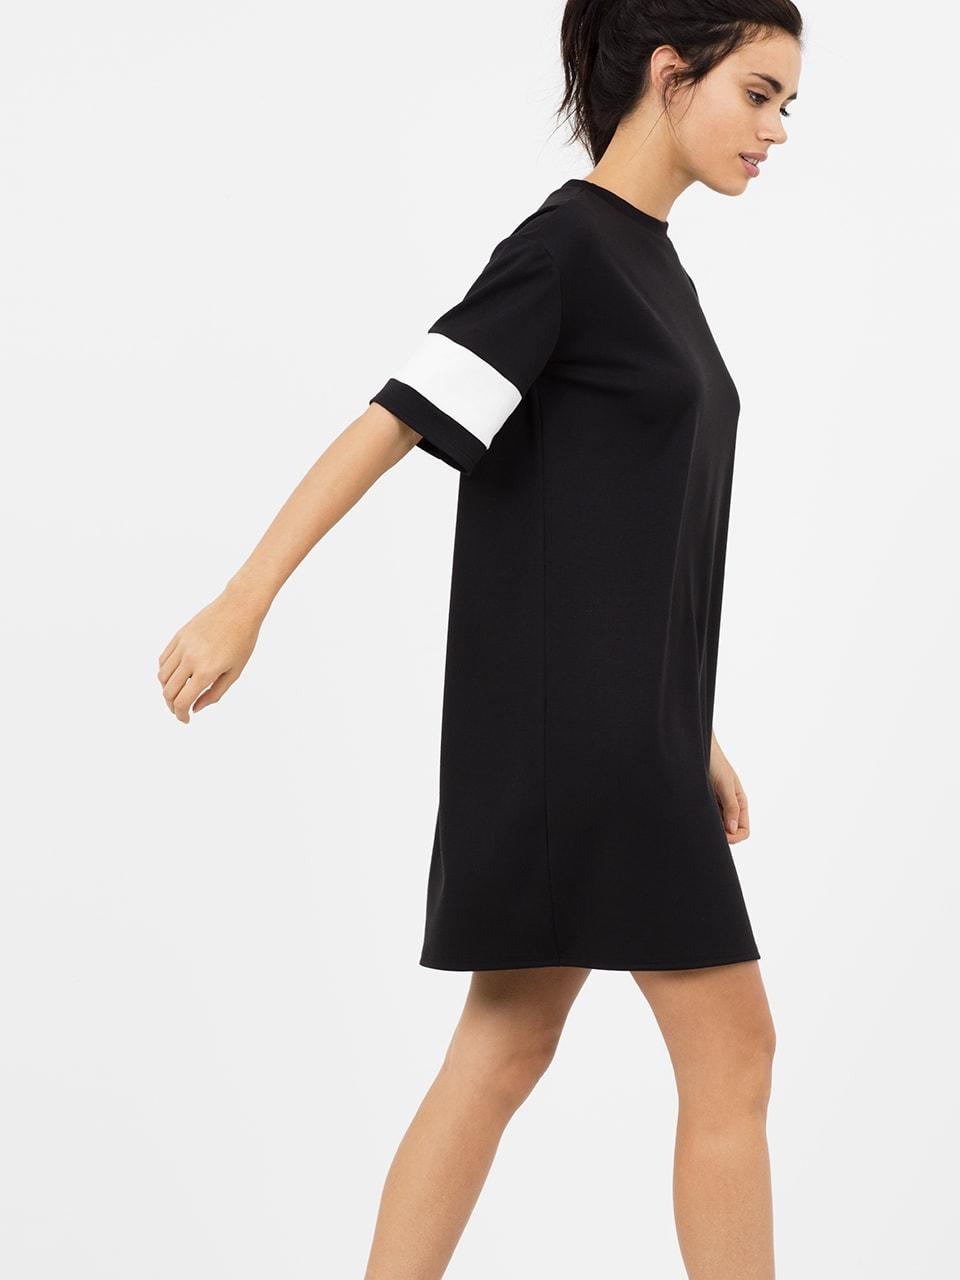 Black/White Sports Colour Block Tee Dress